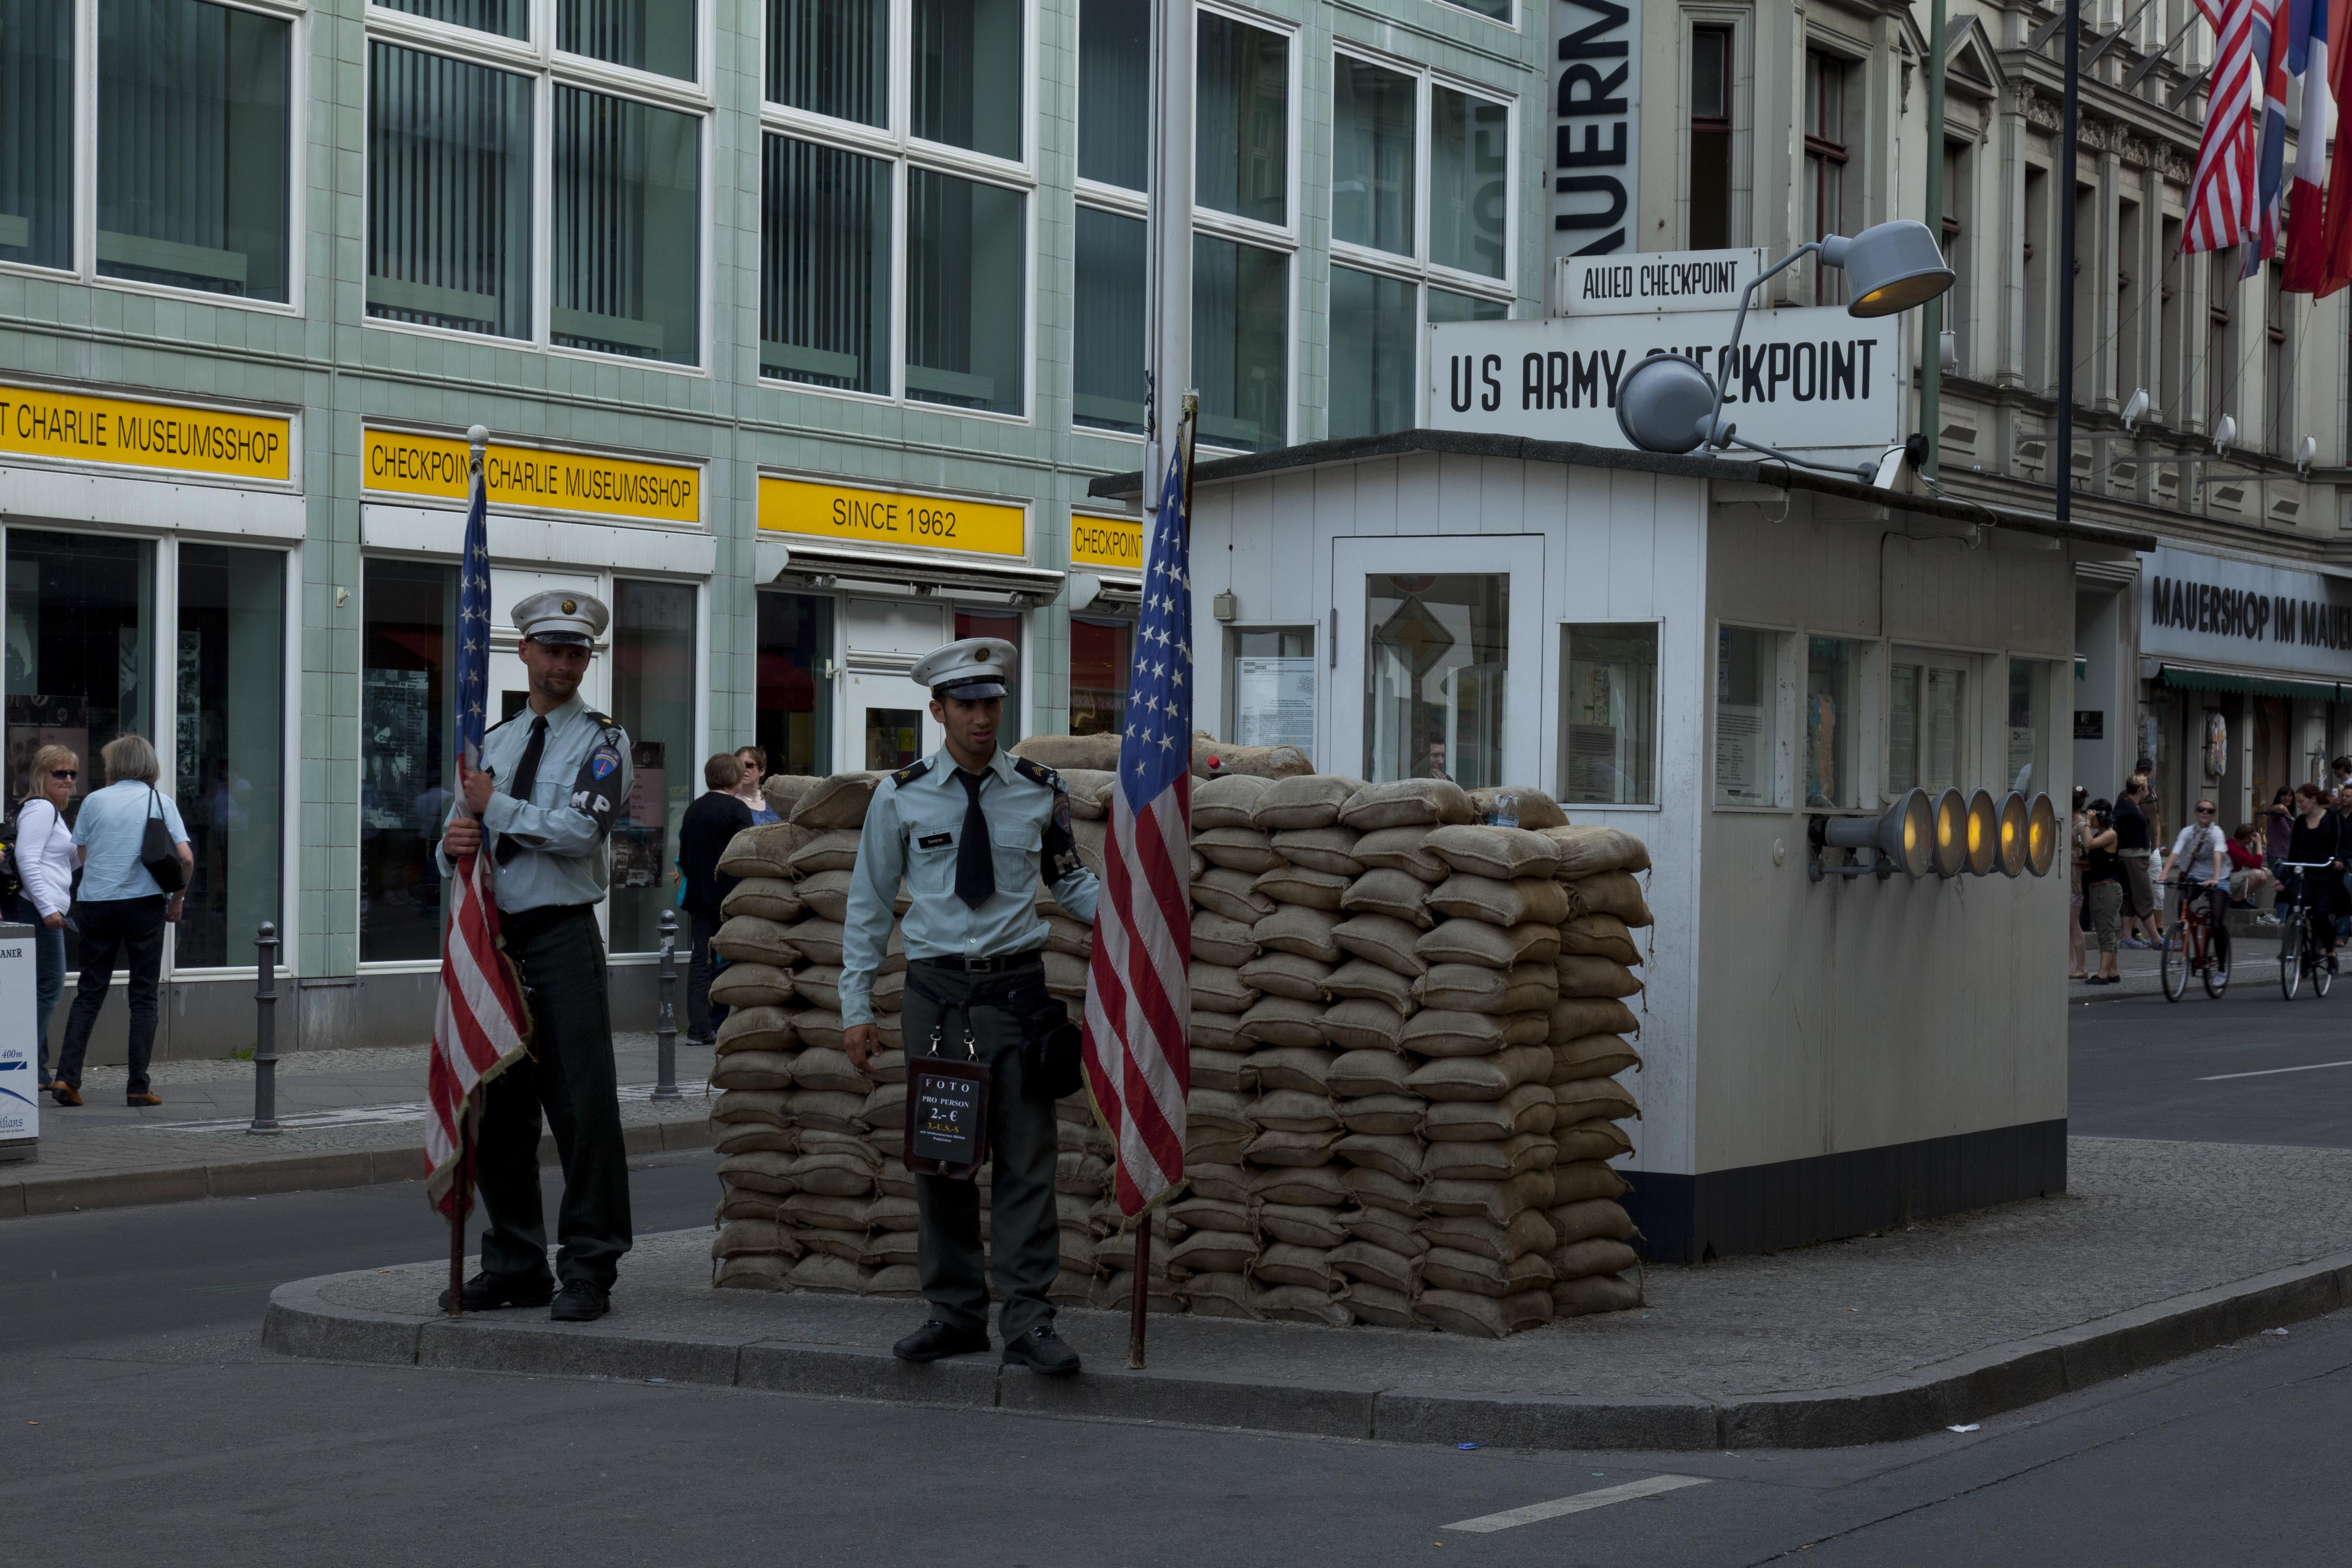 Germany Checkpoint Charlie Check Point Charlie